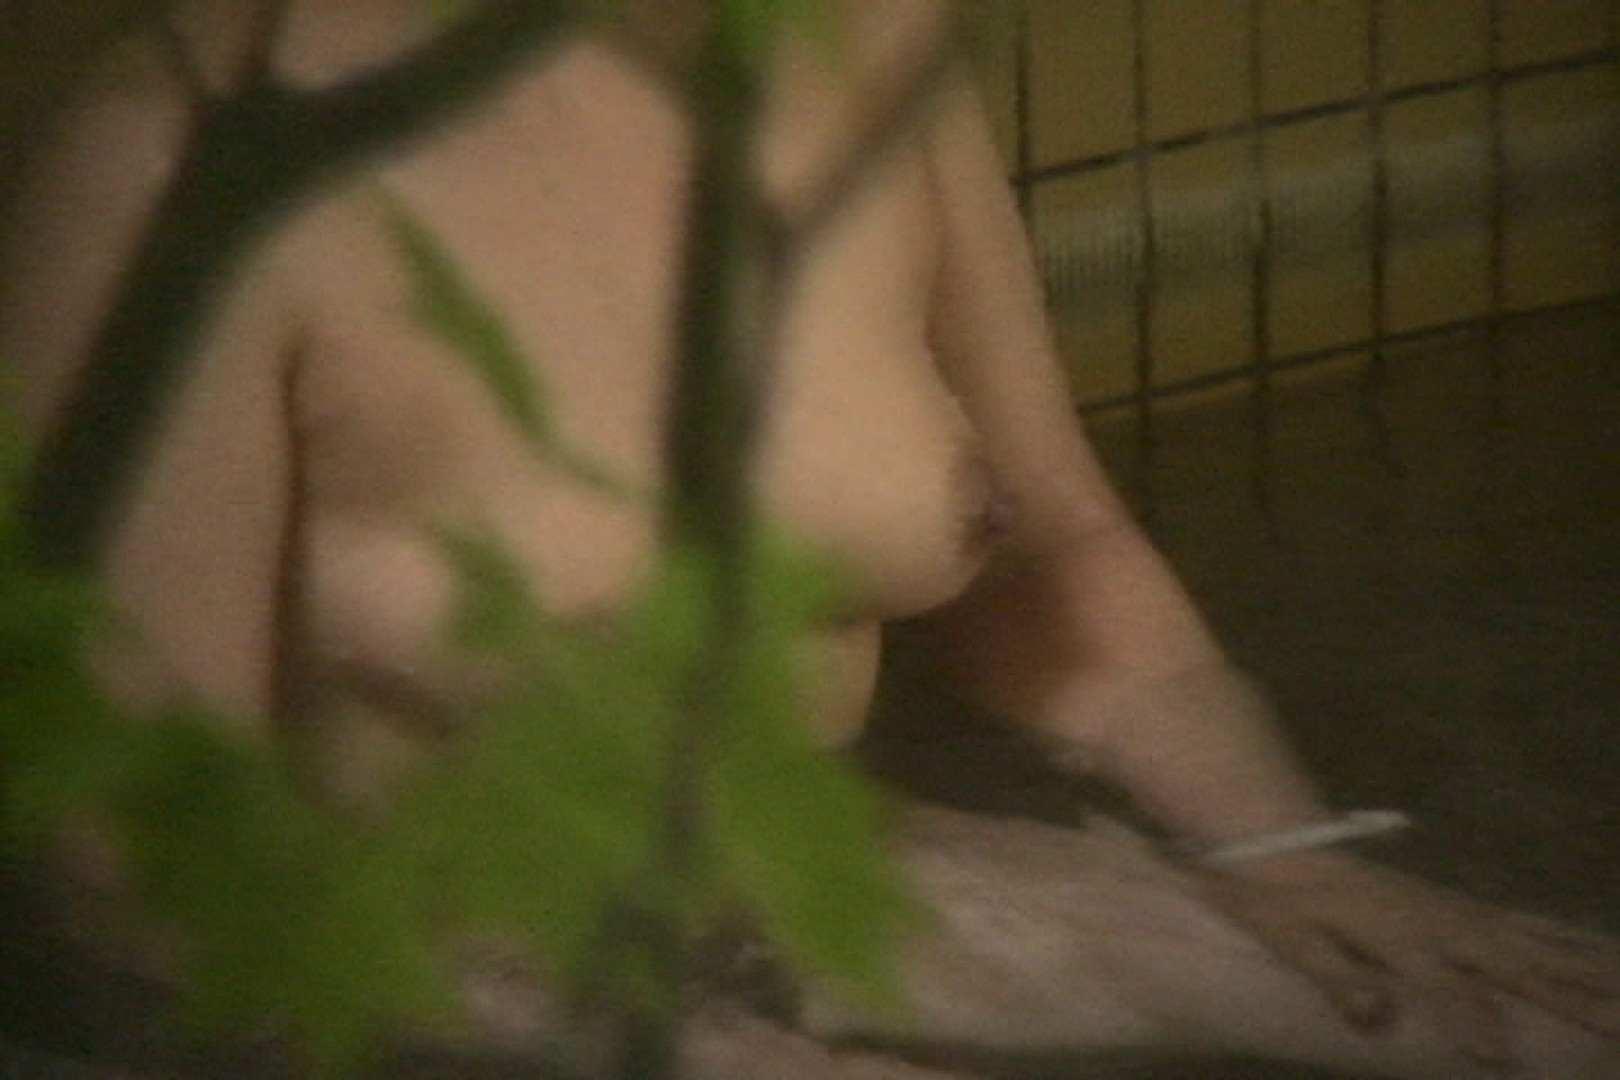 Aquaな露天風呂Vol.456 盗撮 | HなOL  102pic 62